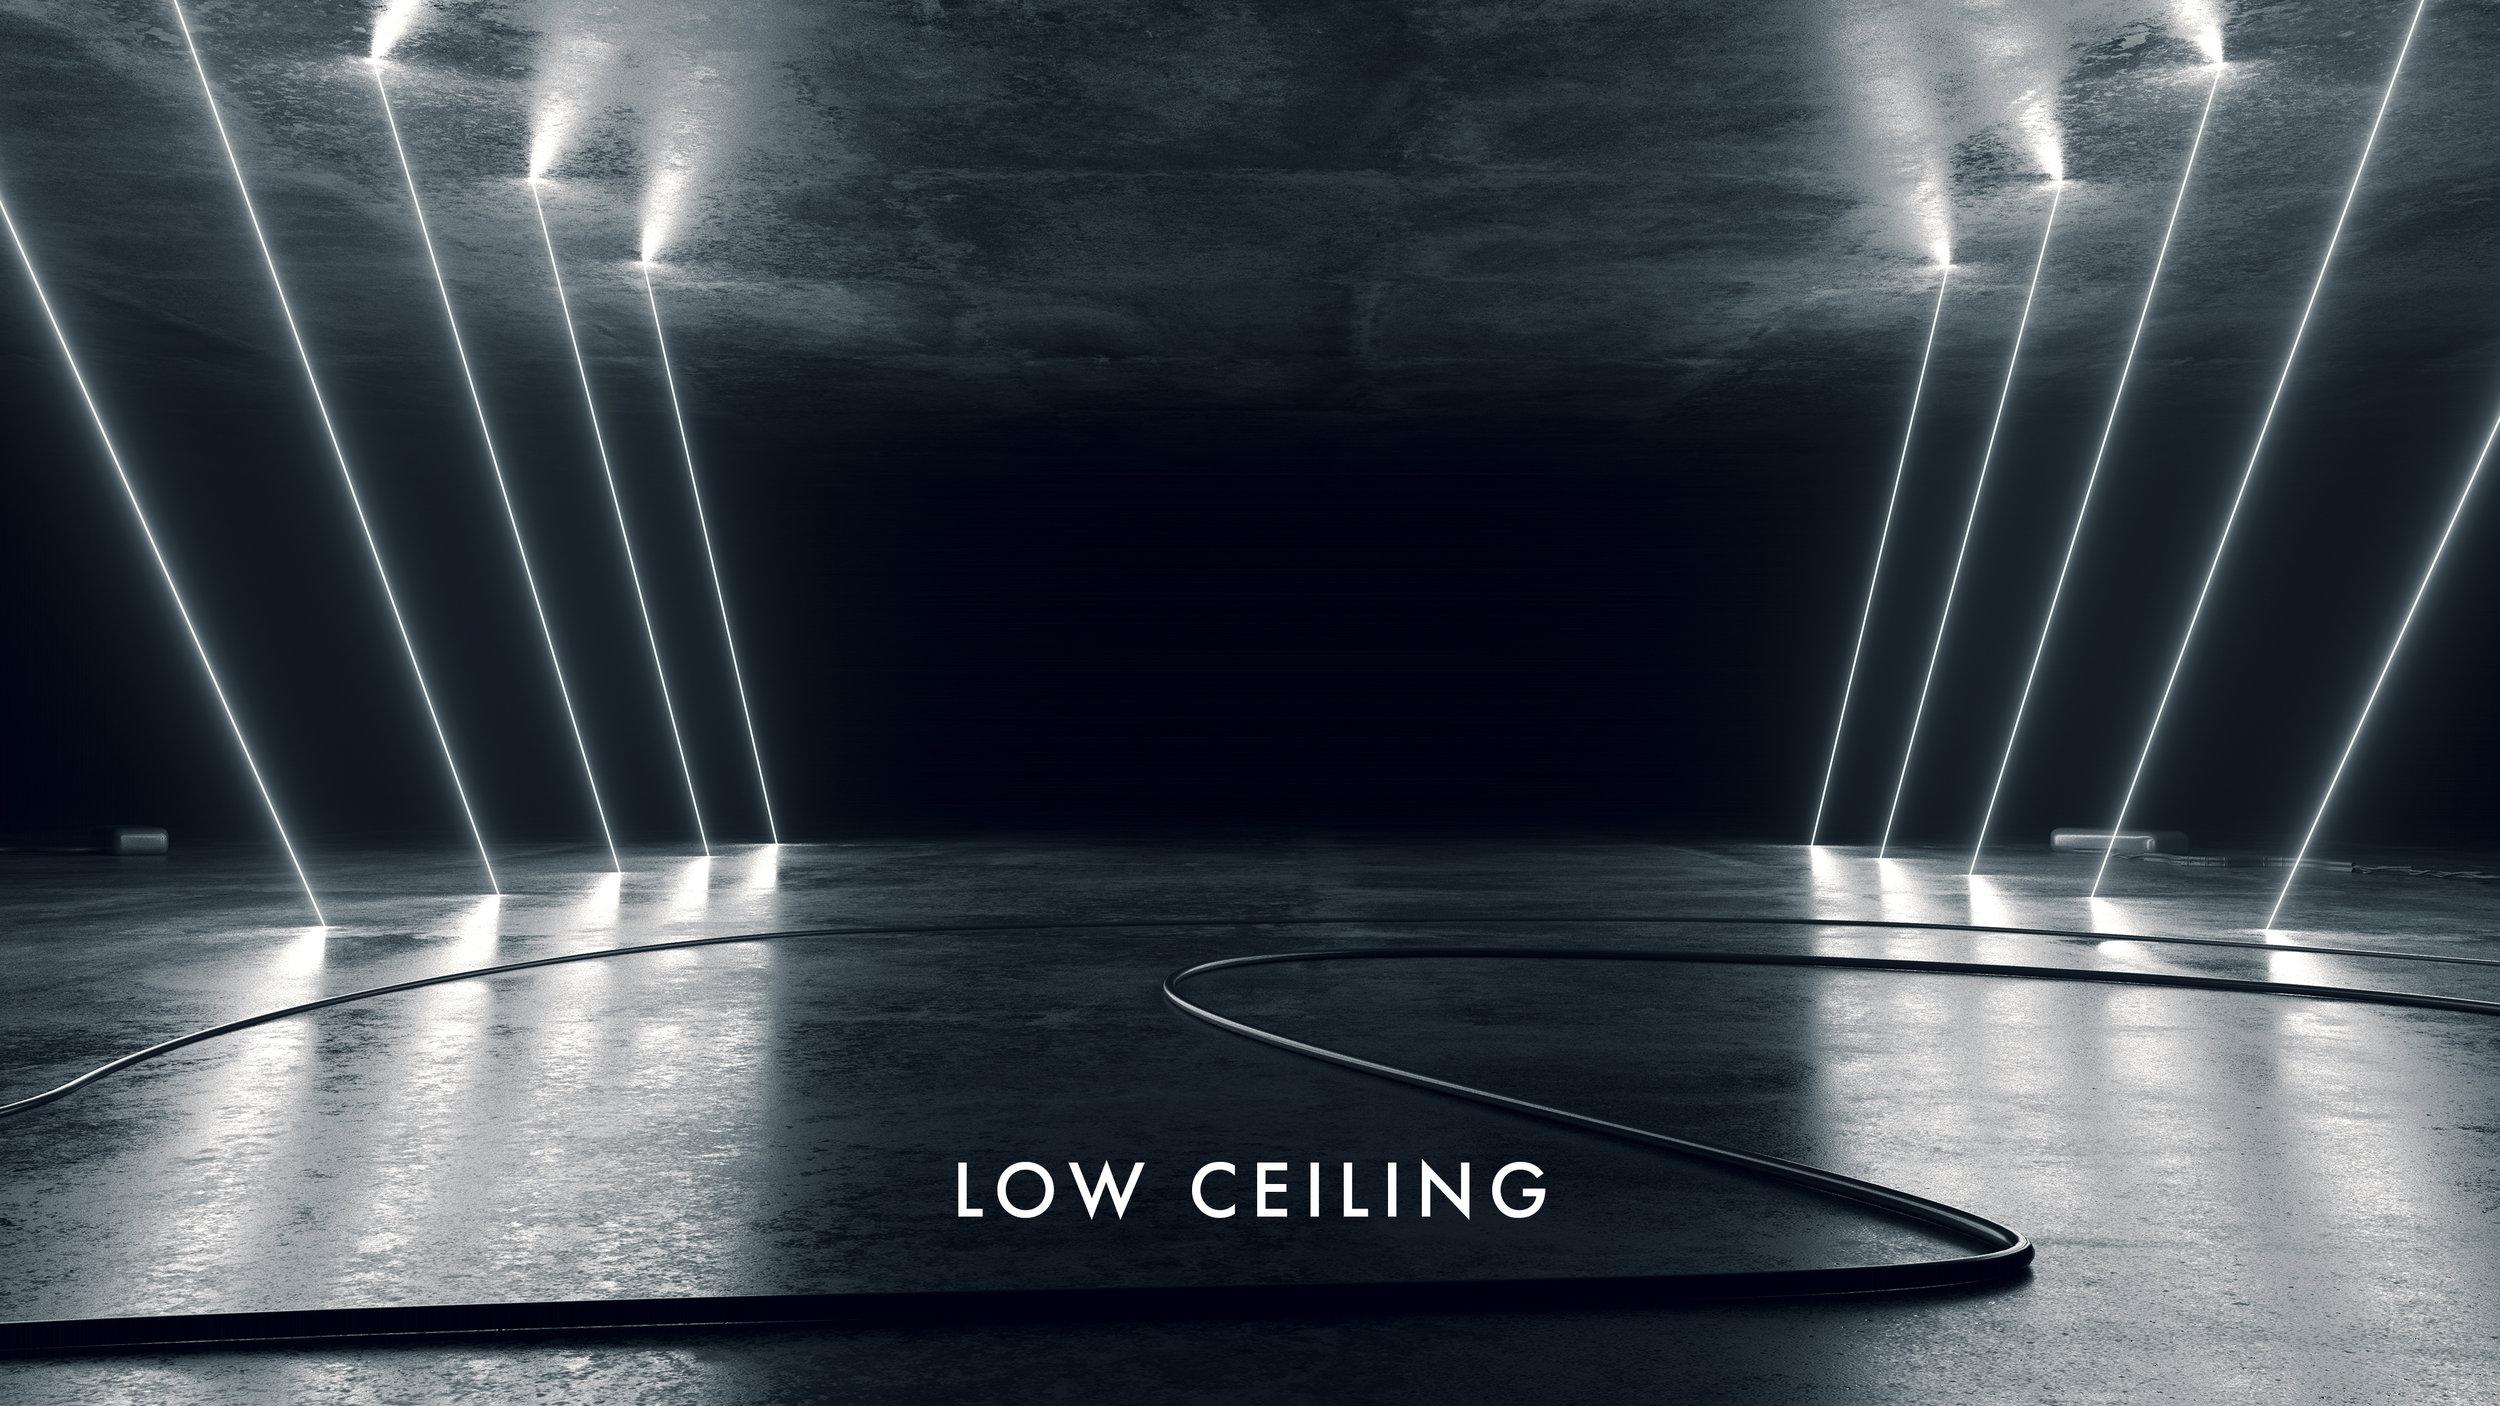 LOW CEILING WALLPAPER8.jpg